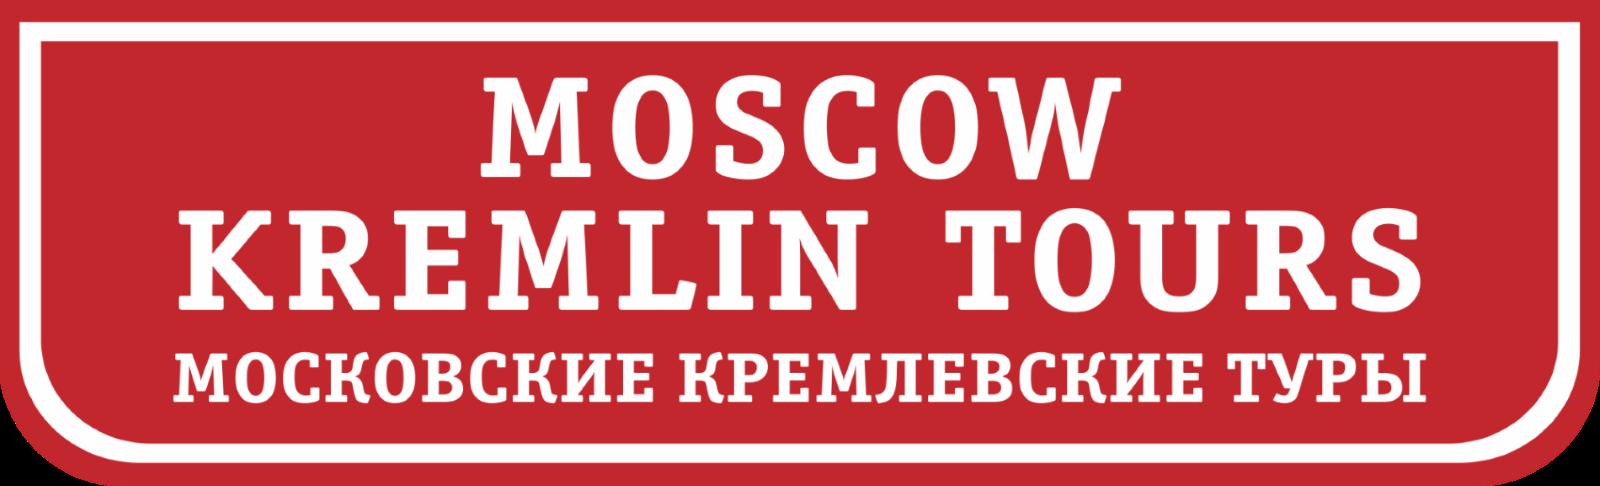 Moscow Kremlin Tours